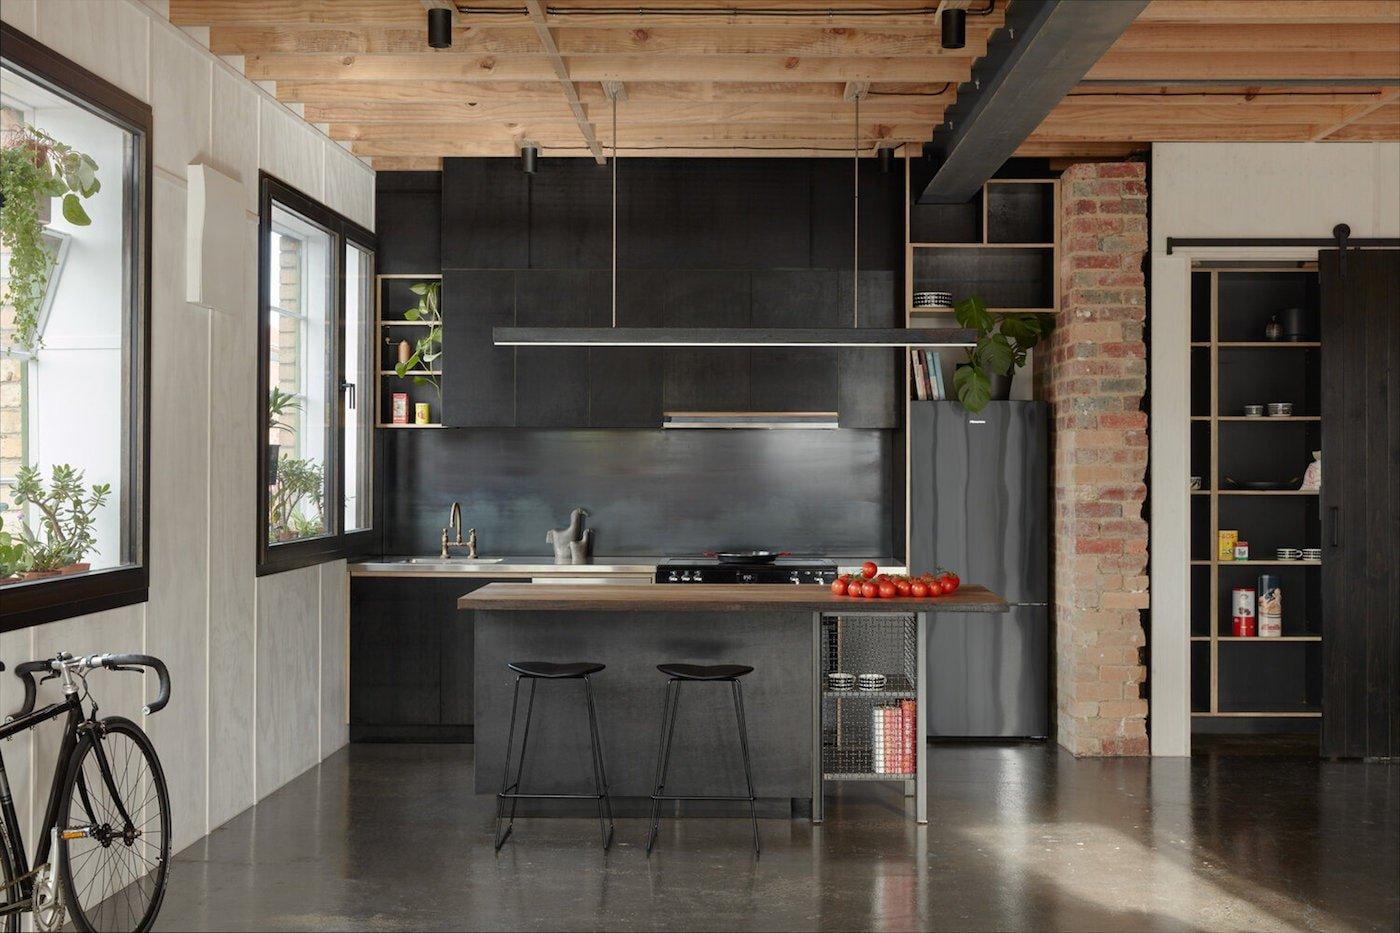 Eco Edition_Breathe Architecture_Warehouse Greenhouse_Architecture sustainability 2-min